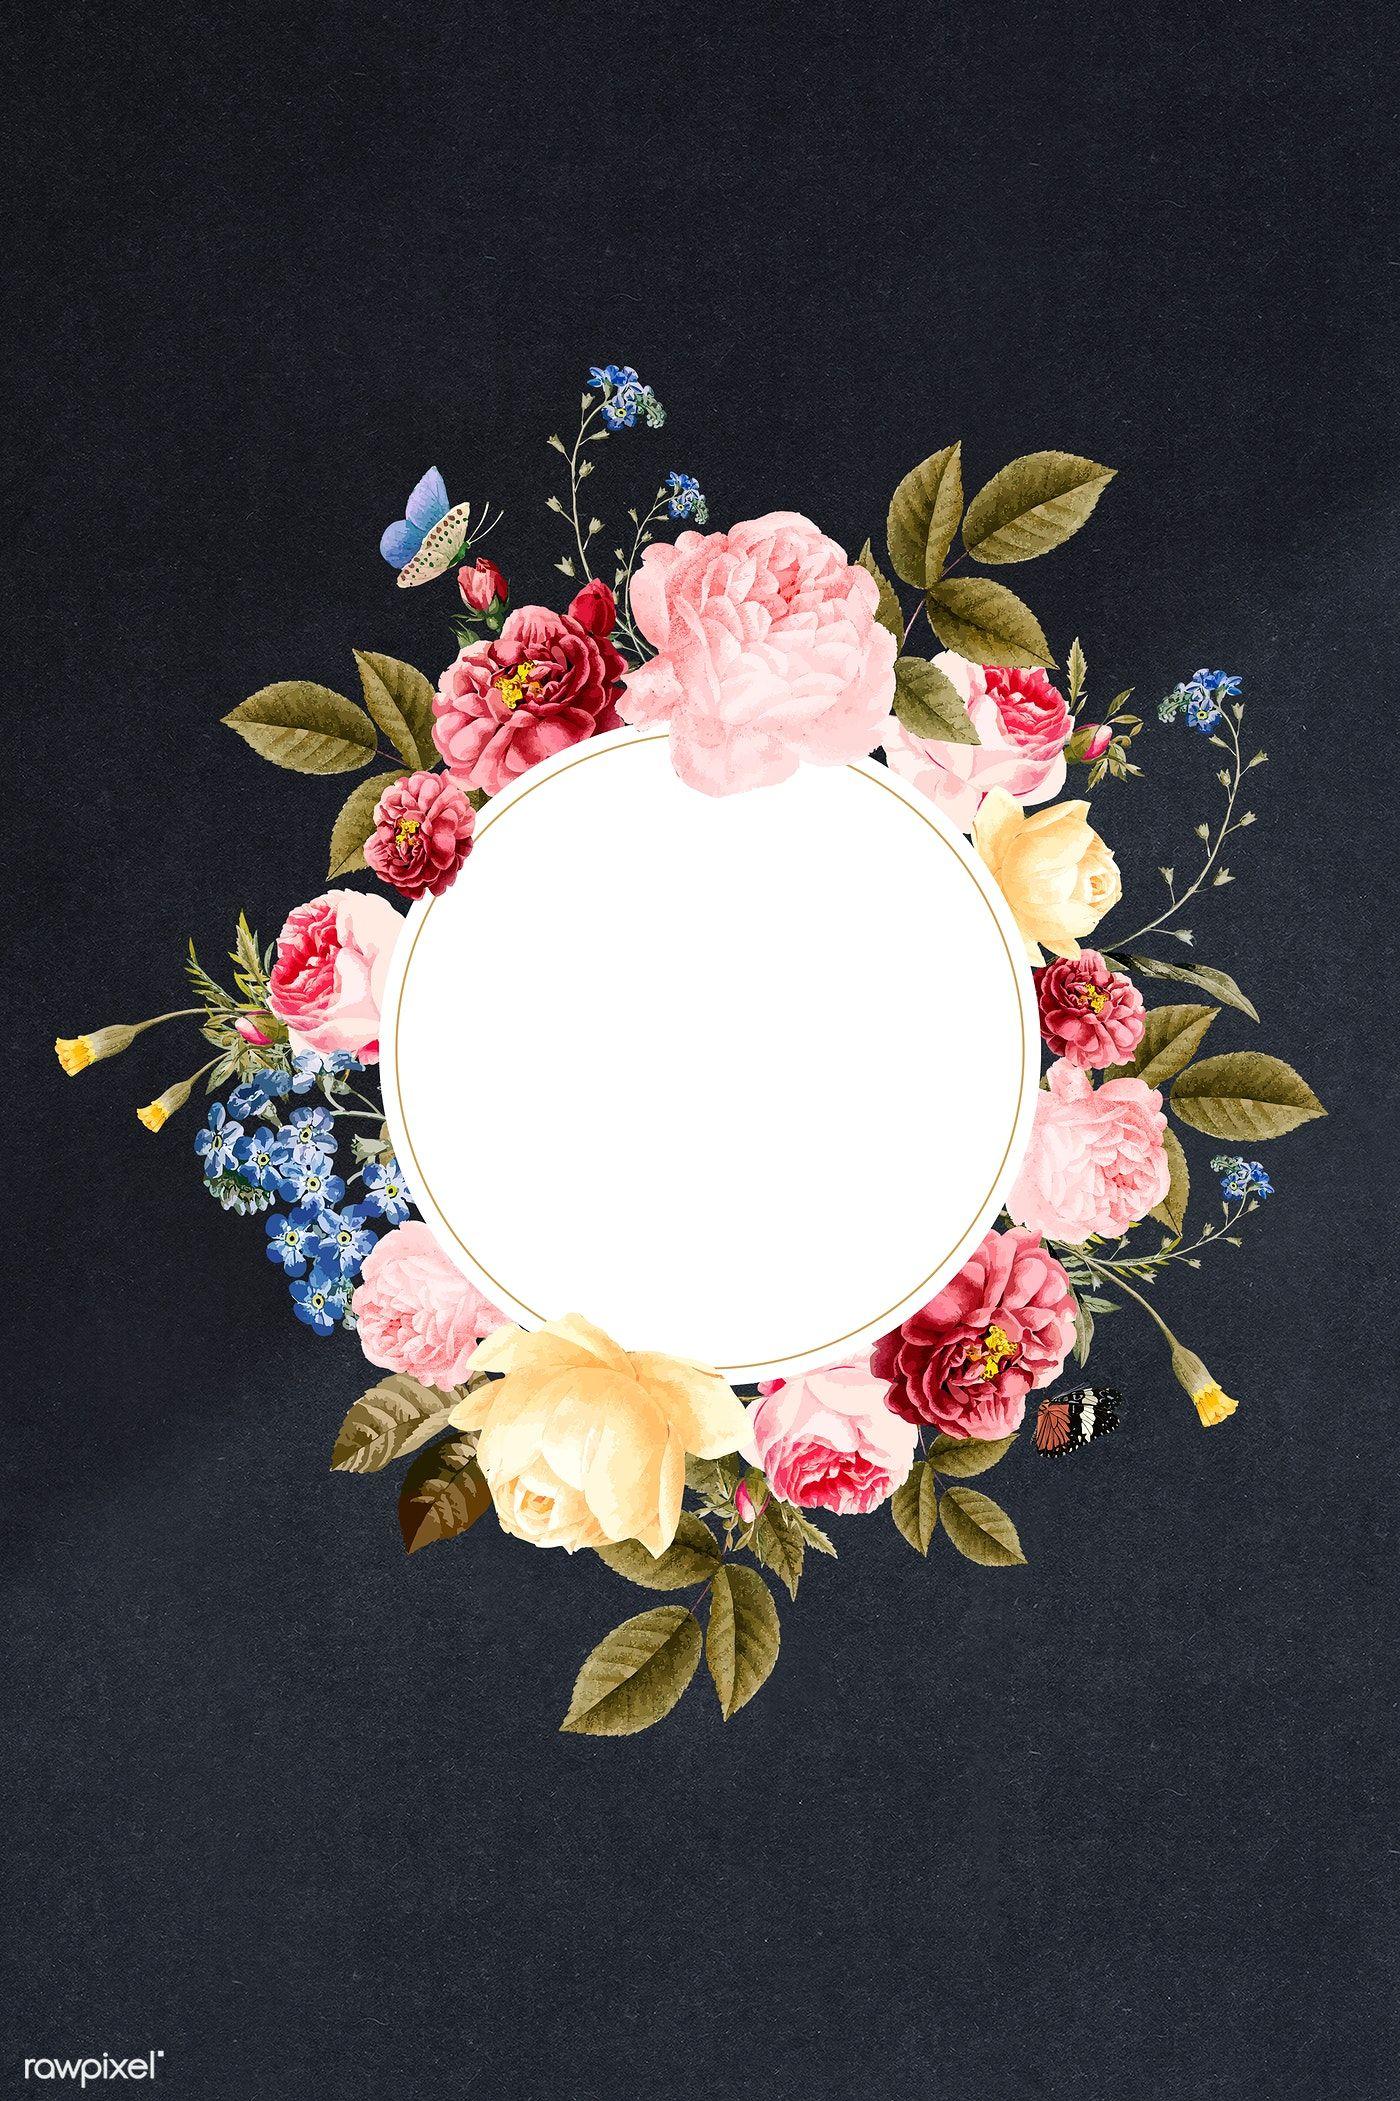 Download premium illustration of Floral round frame on a